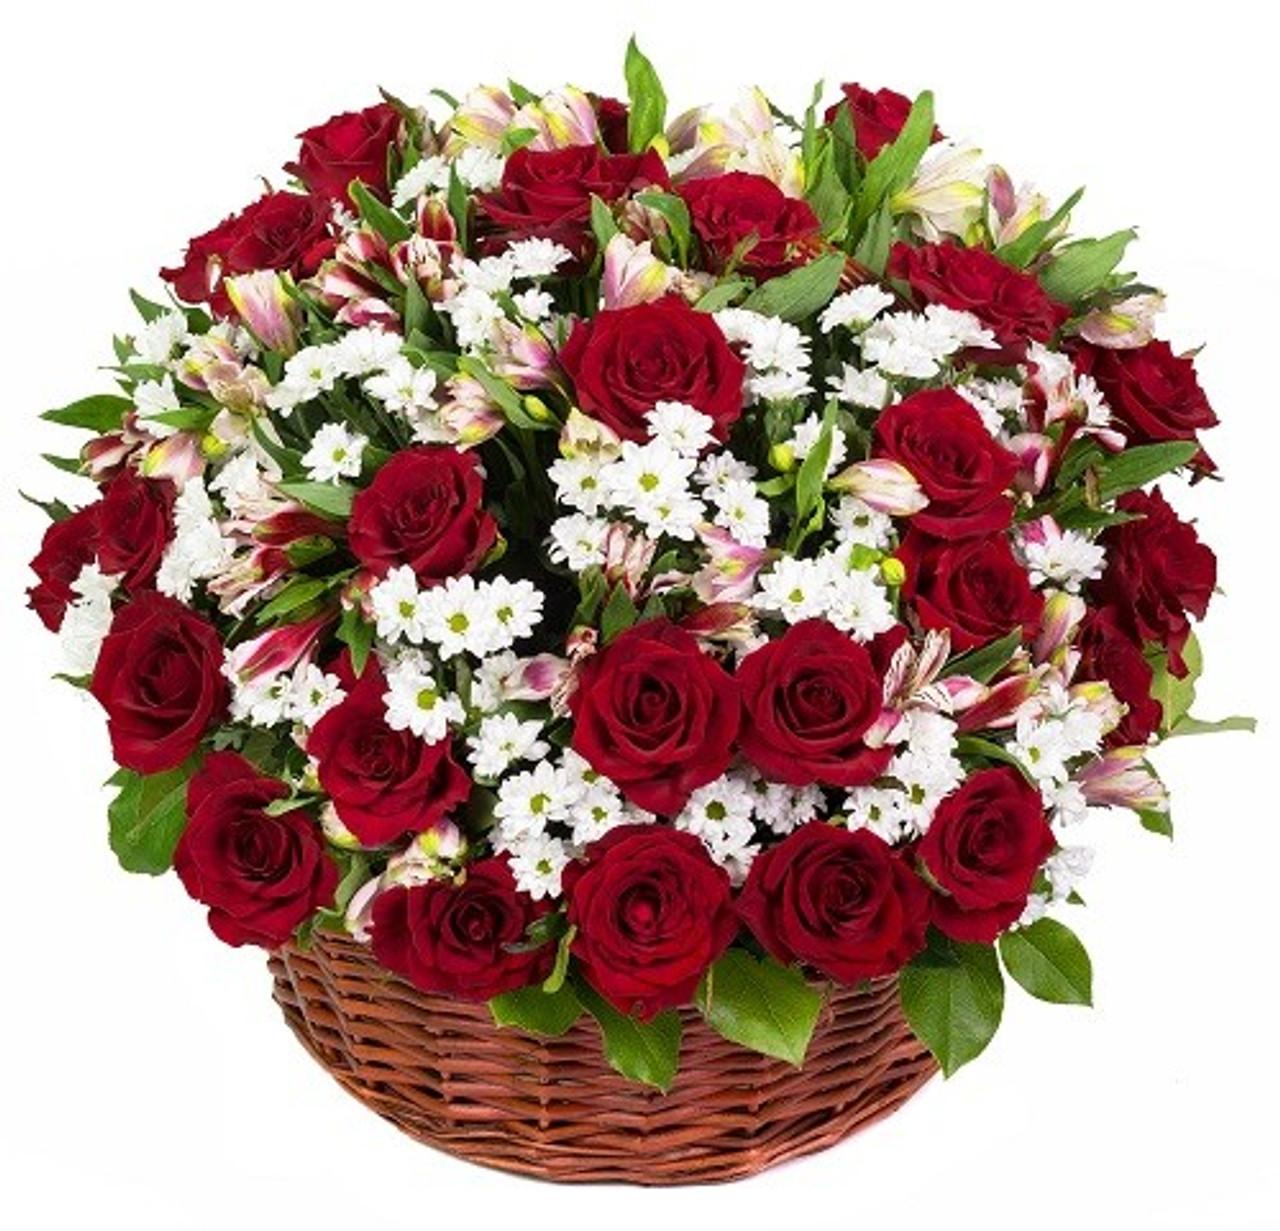 Customizable Basket of Roses